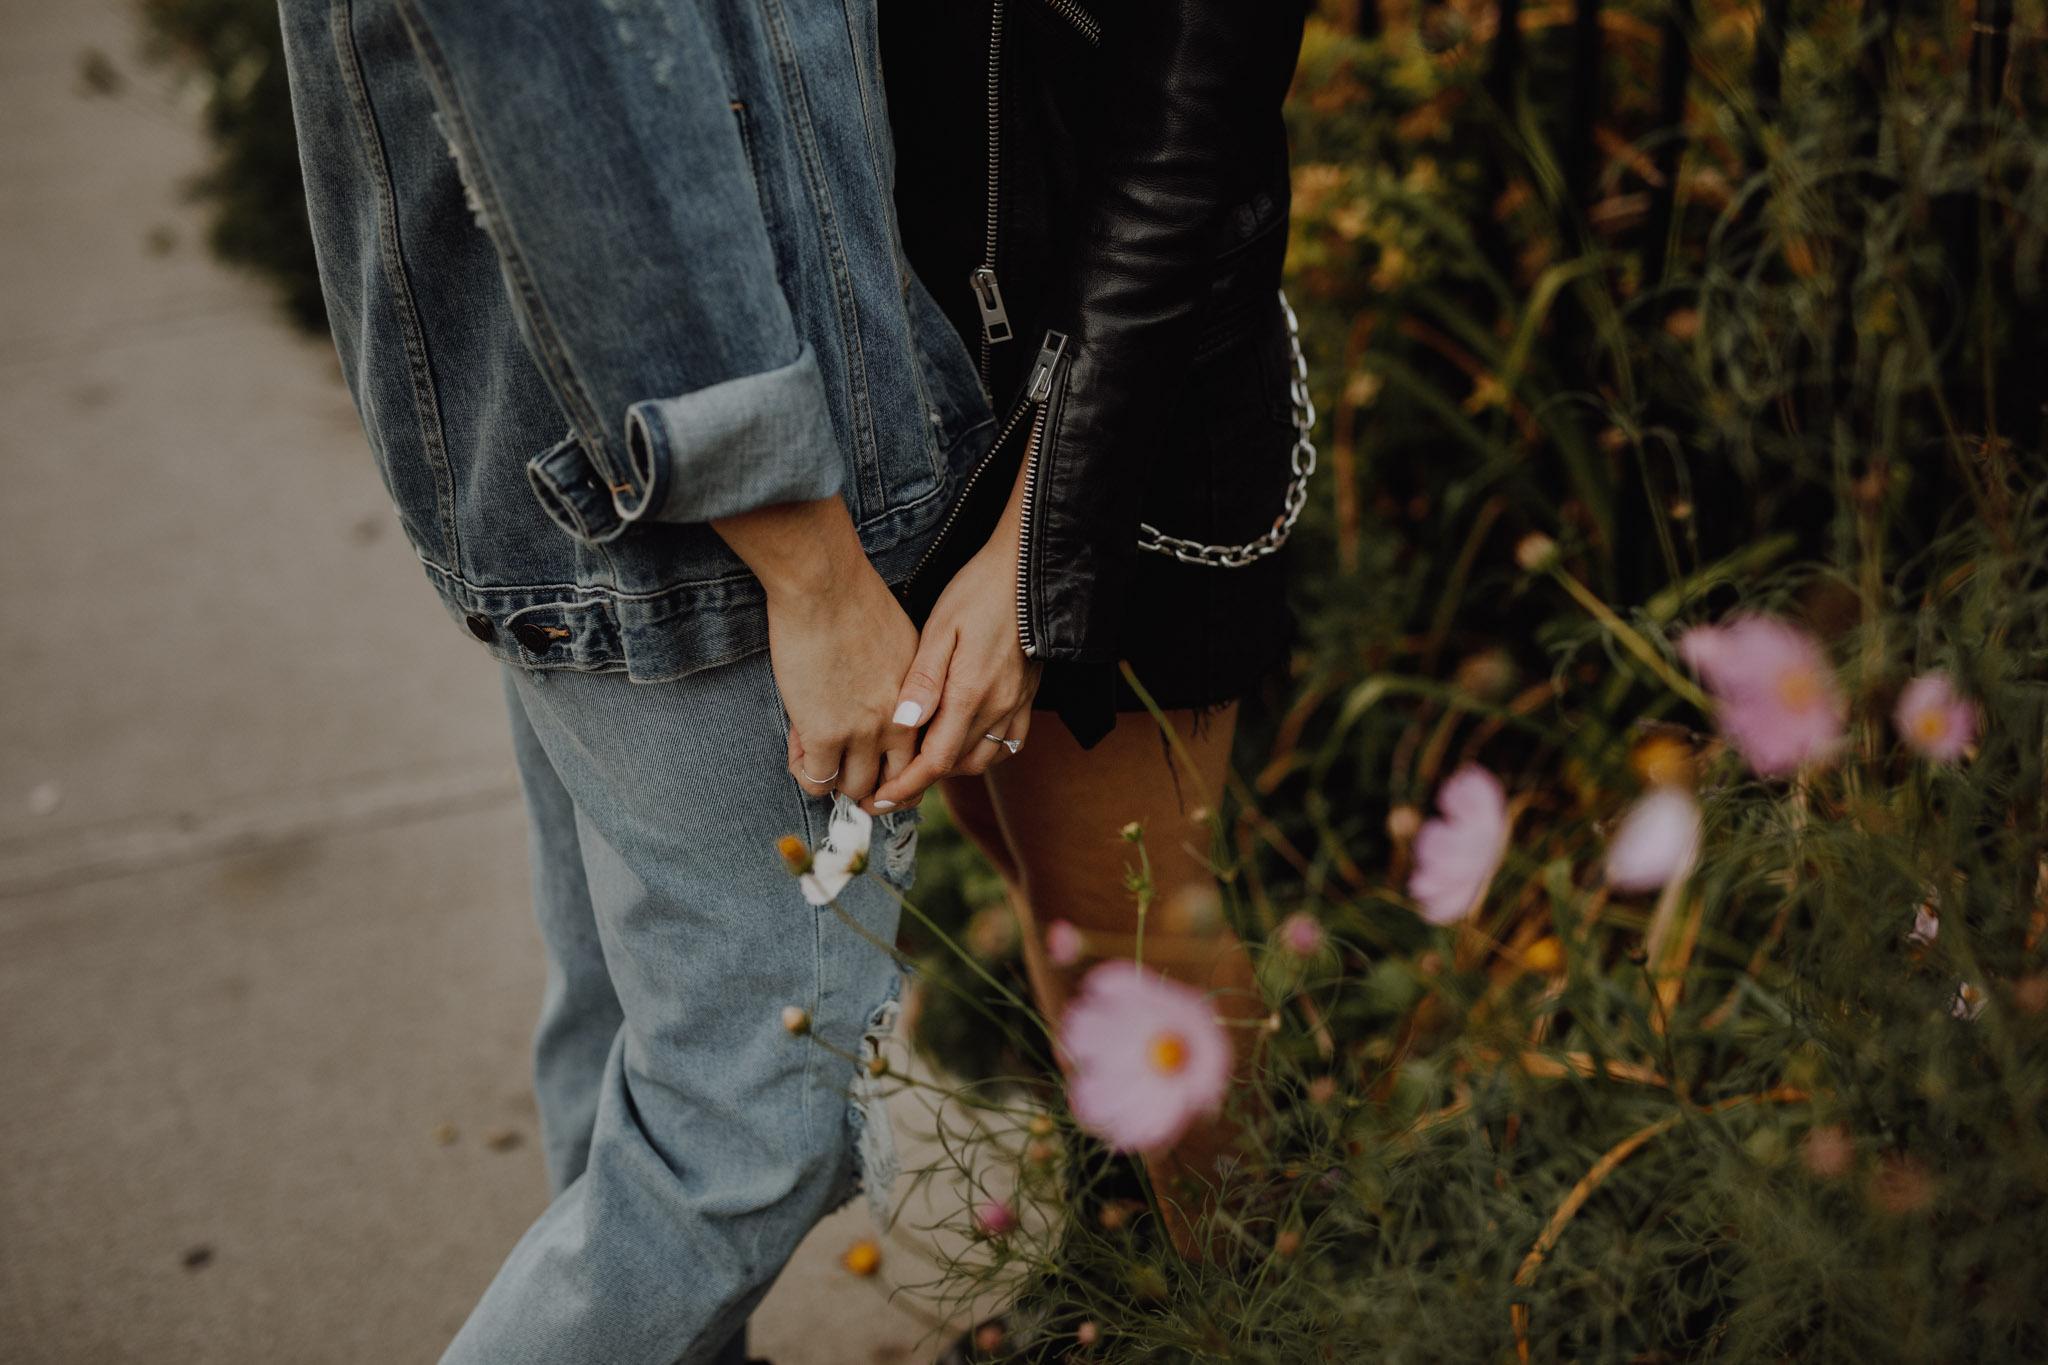 Mcdonalds engagement session - holding hands near flowers